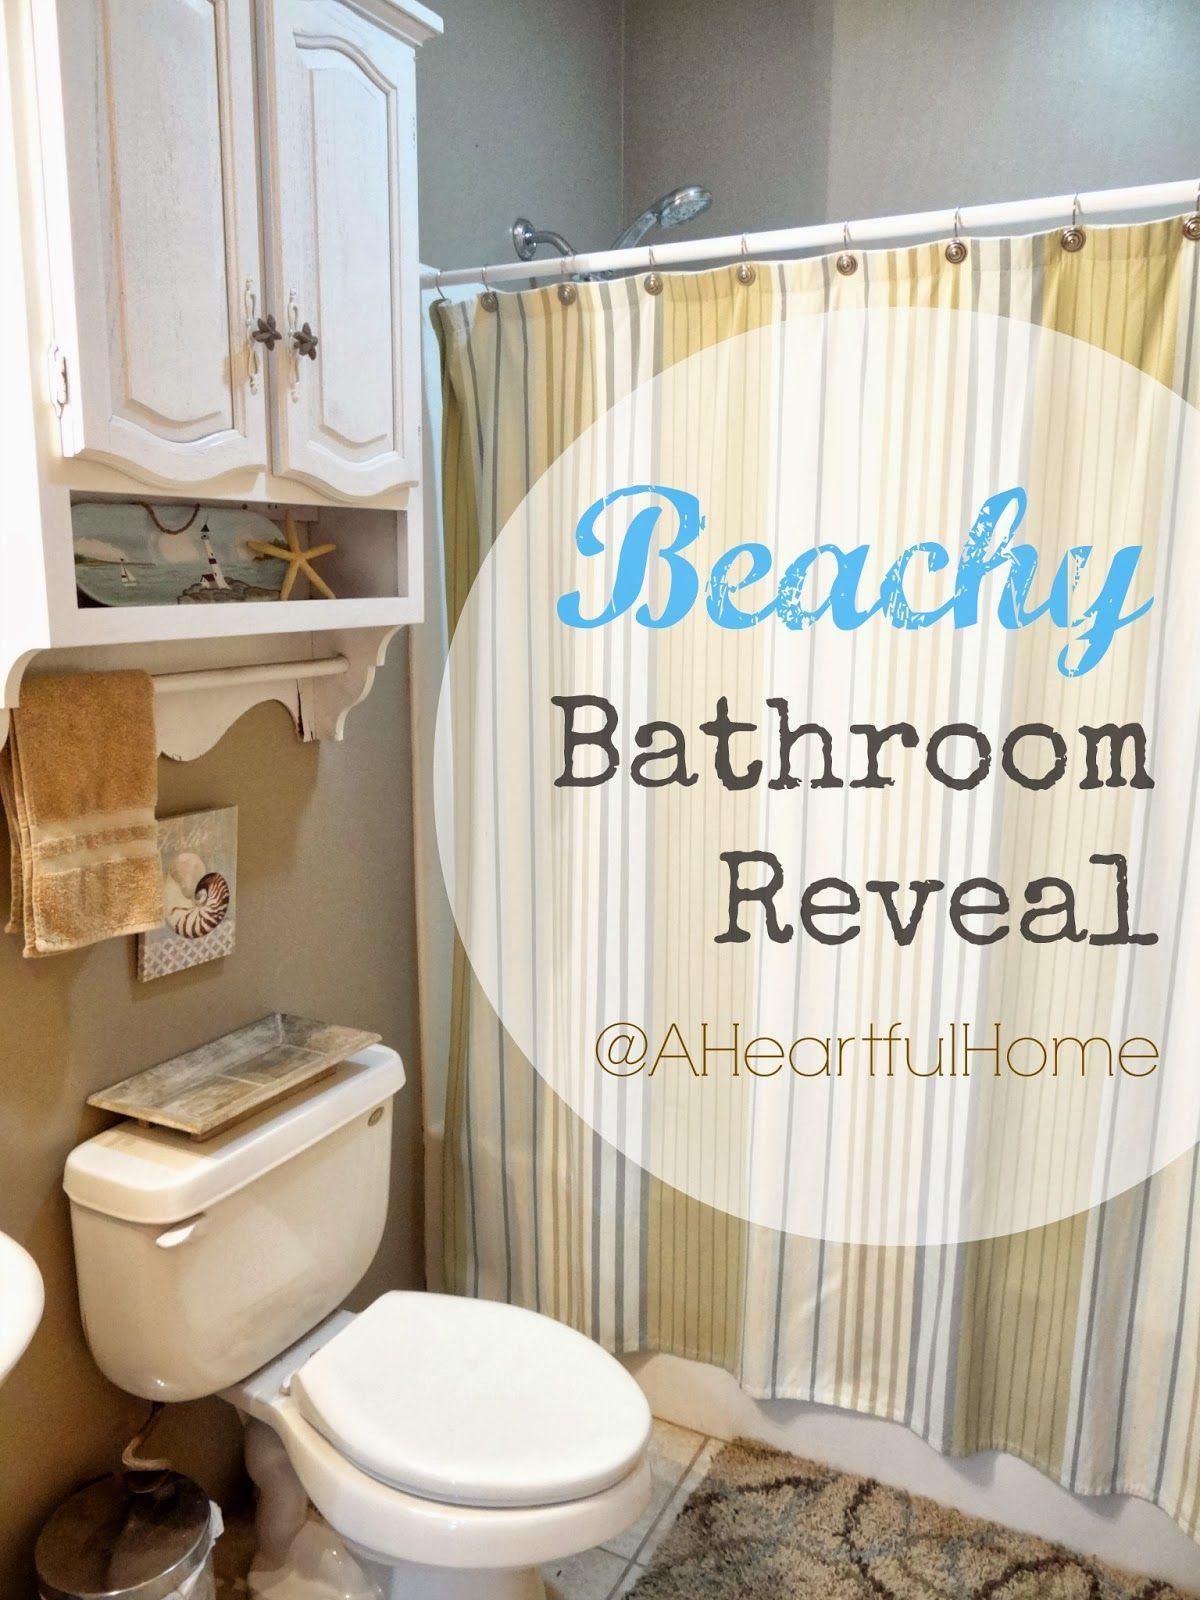 Coastal Living Bathrooms | Displaying 18> Images For - Coastal Living  Bathrooms... Decorating BathroomsBathroom RenovationsBathroom IdeasBathrooms  ...